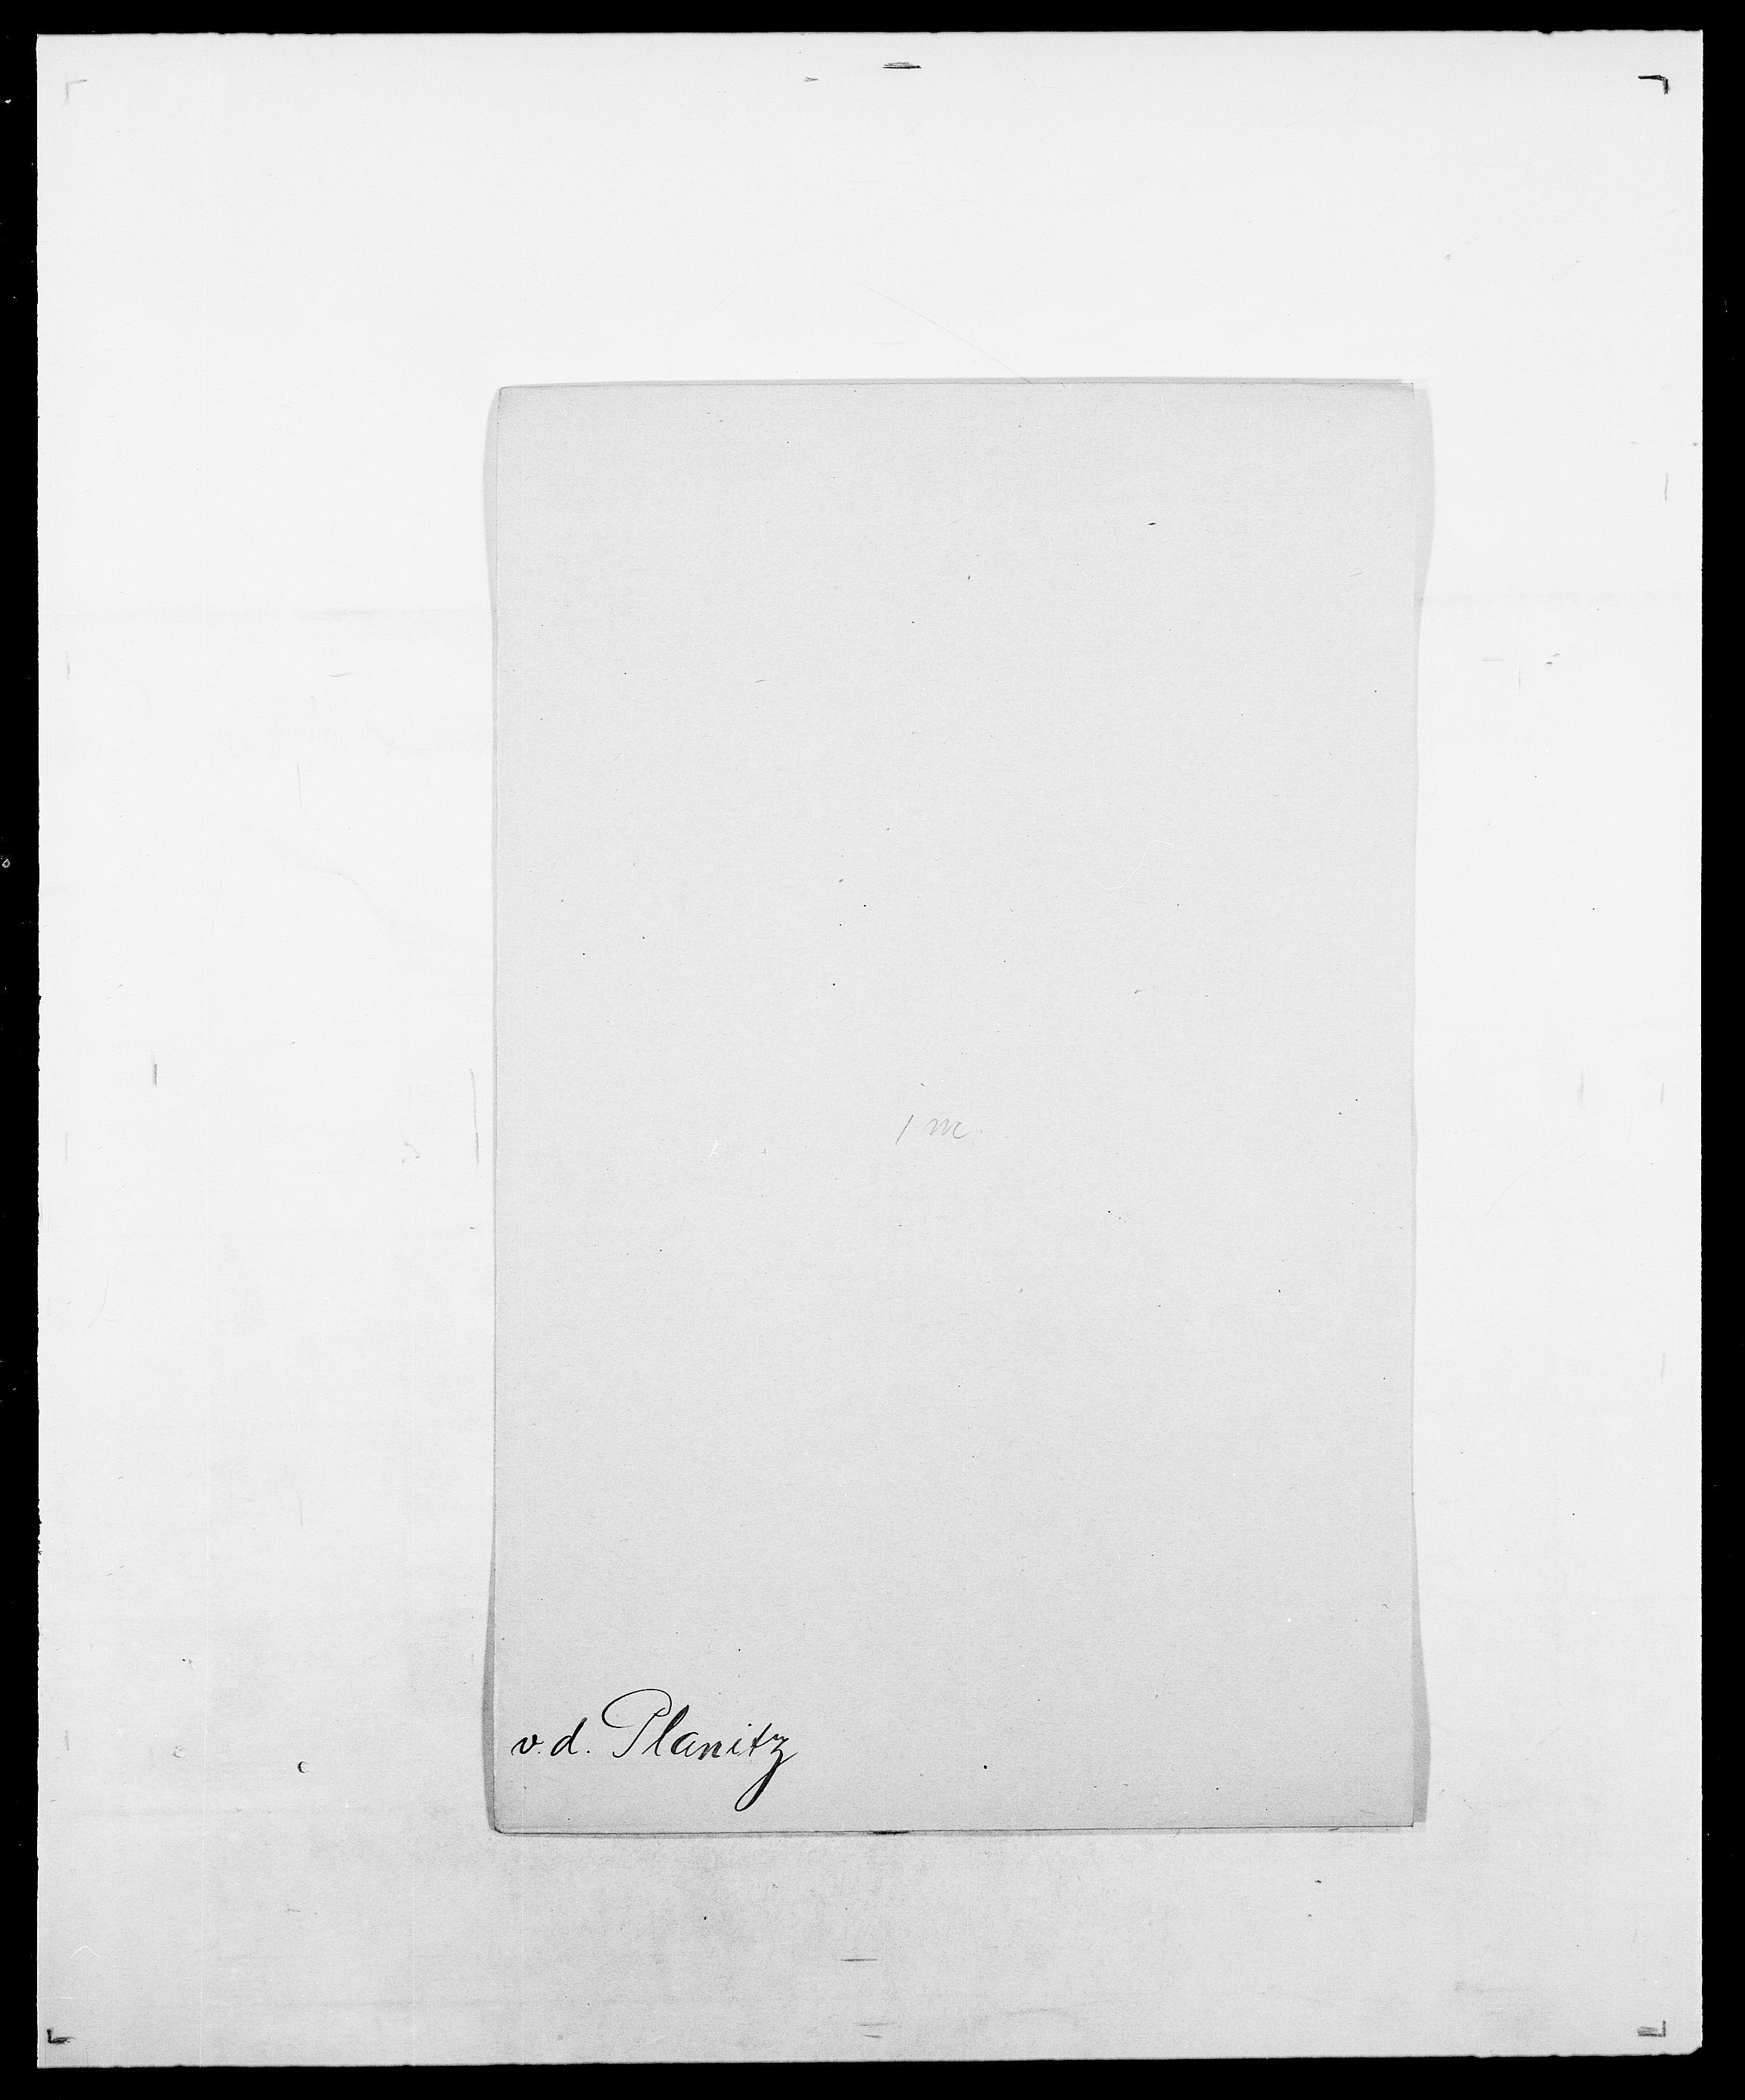 SAO, Delgobe, Charles Antoine - samling, D/Da/L0031: de Place - Raaum, s. 23